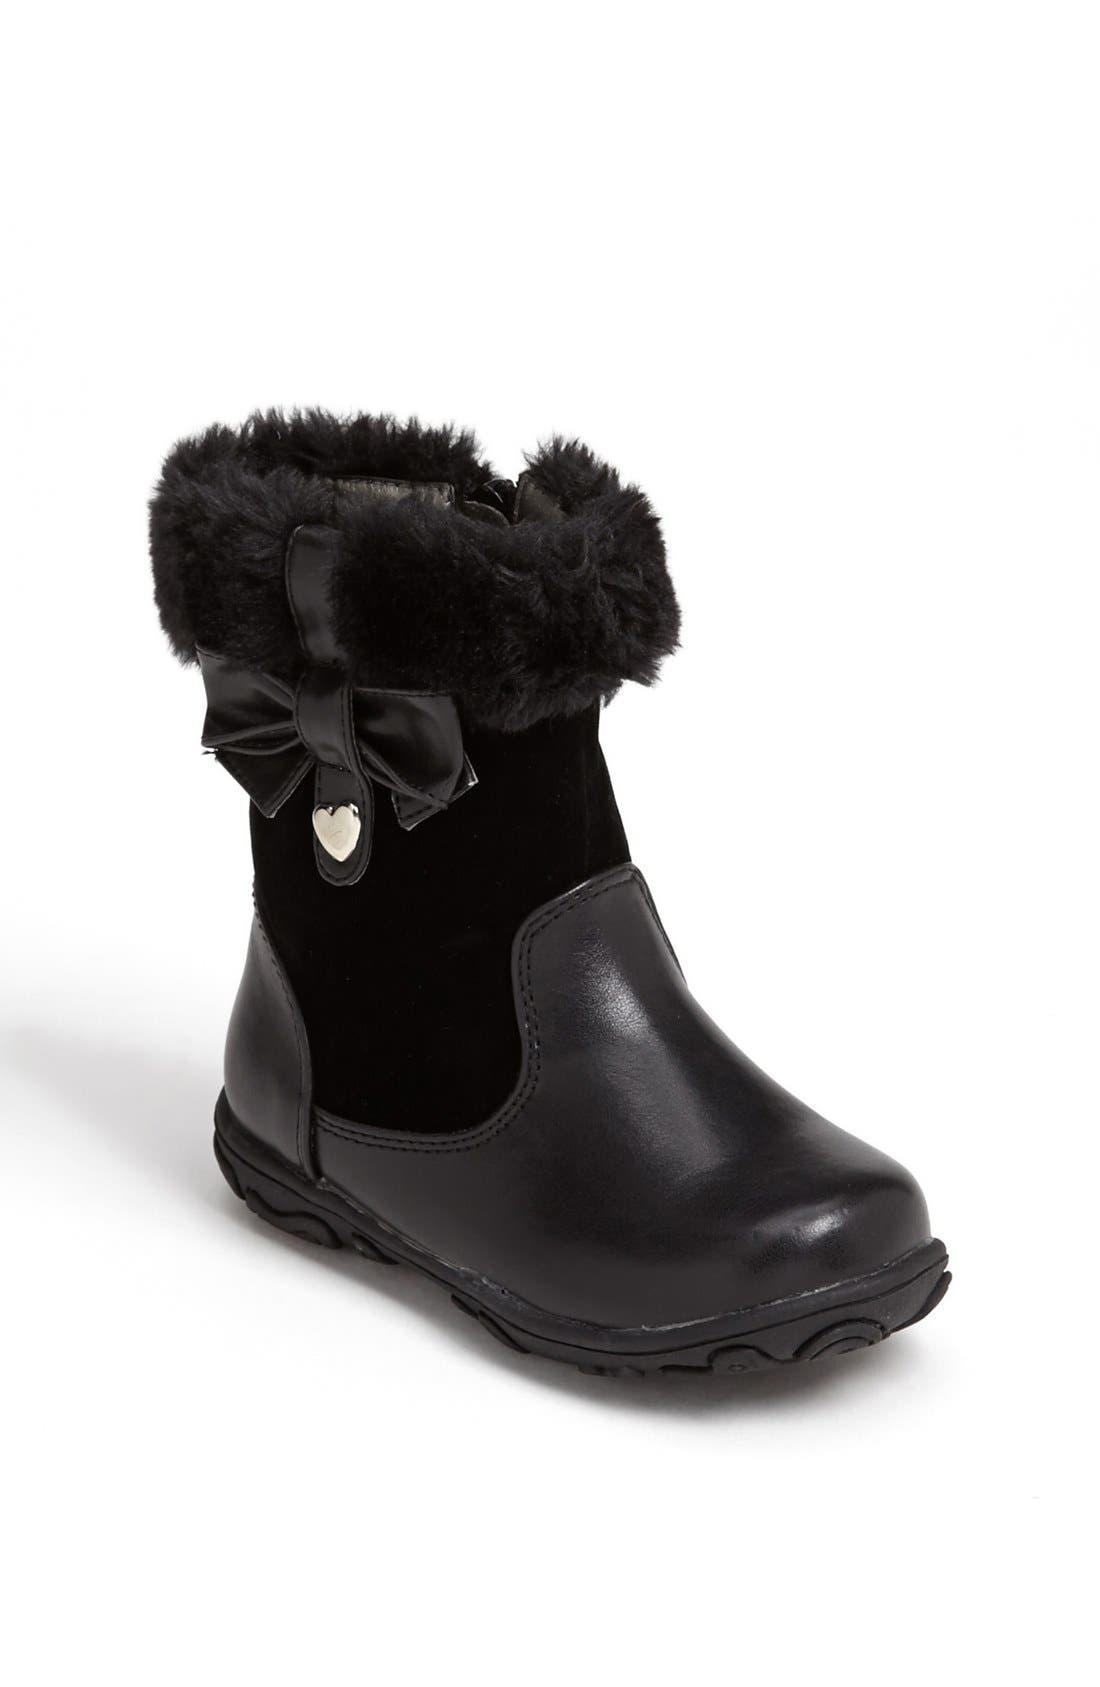 Main Image - Laura Ashley 'Bow' Boot (Walker & Toddler)